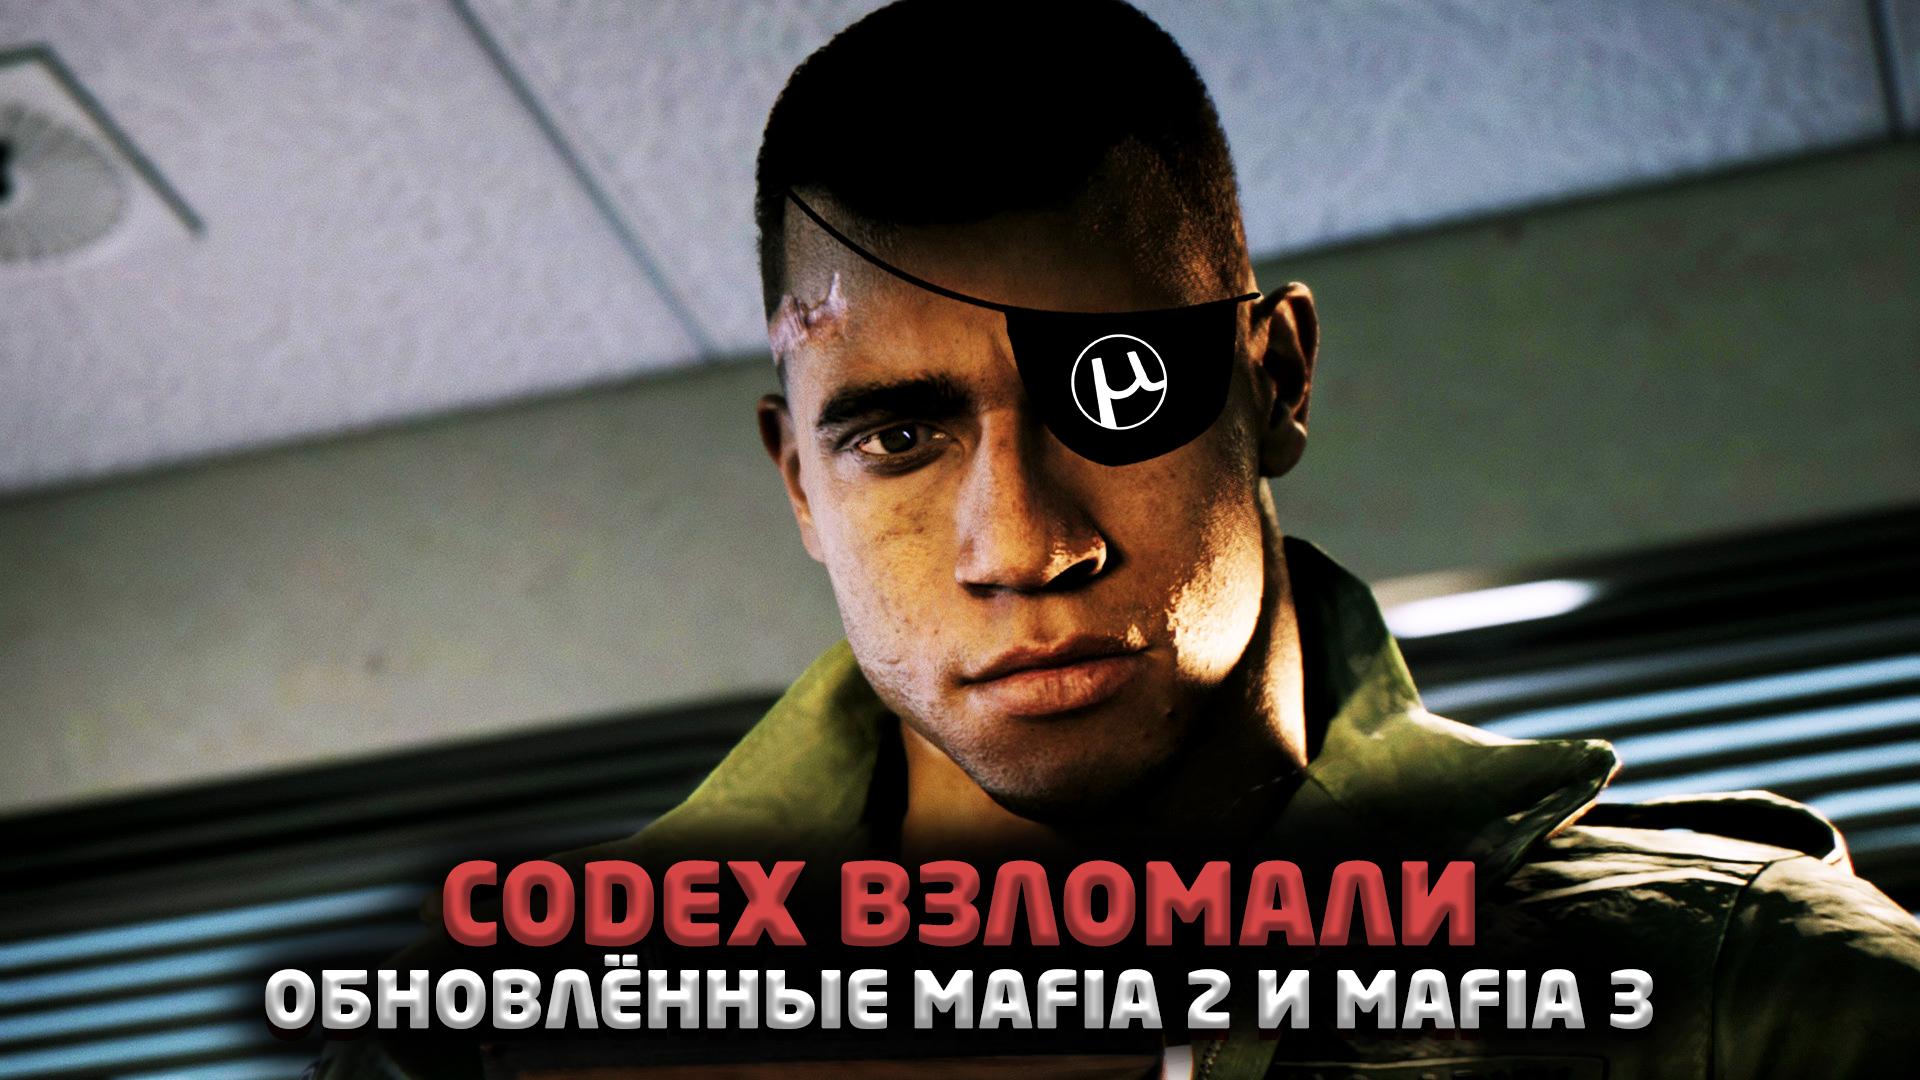 CODEX взломали обновлённые Mafia 2 и Mafia 3